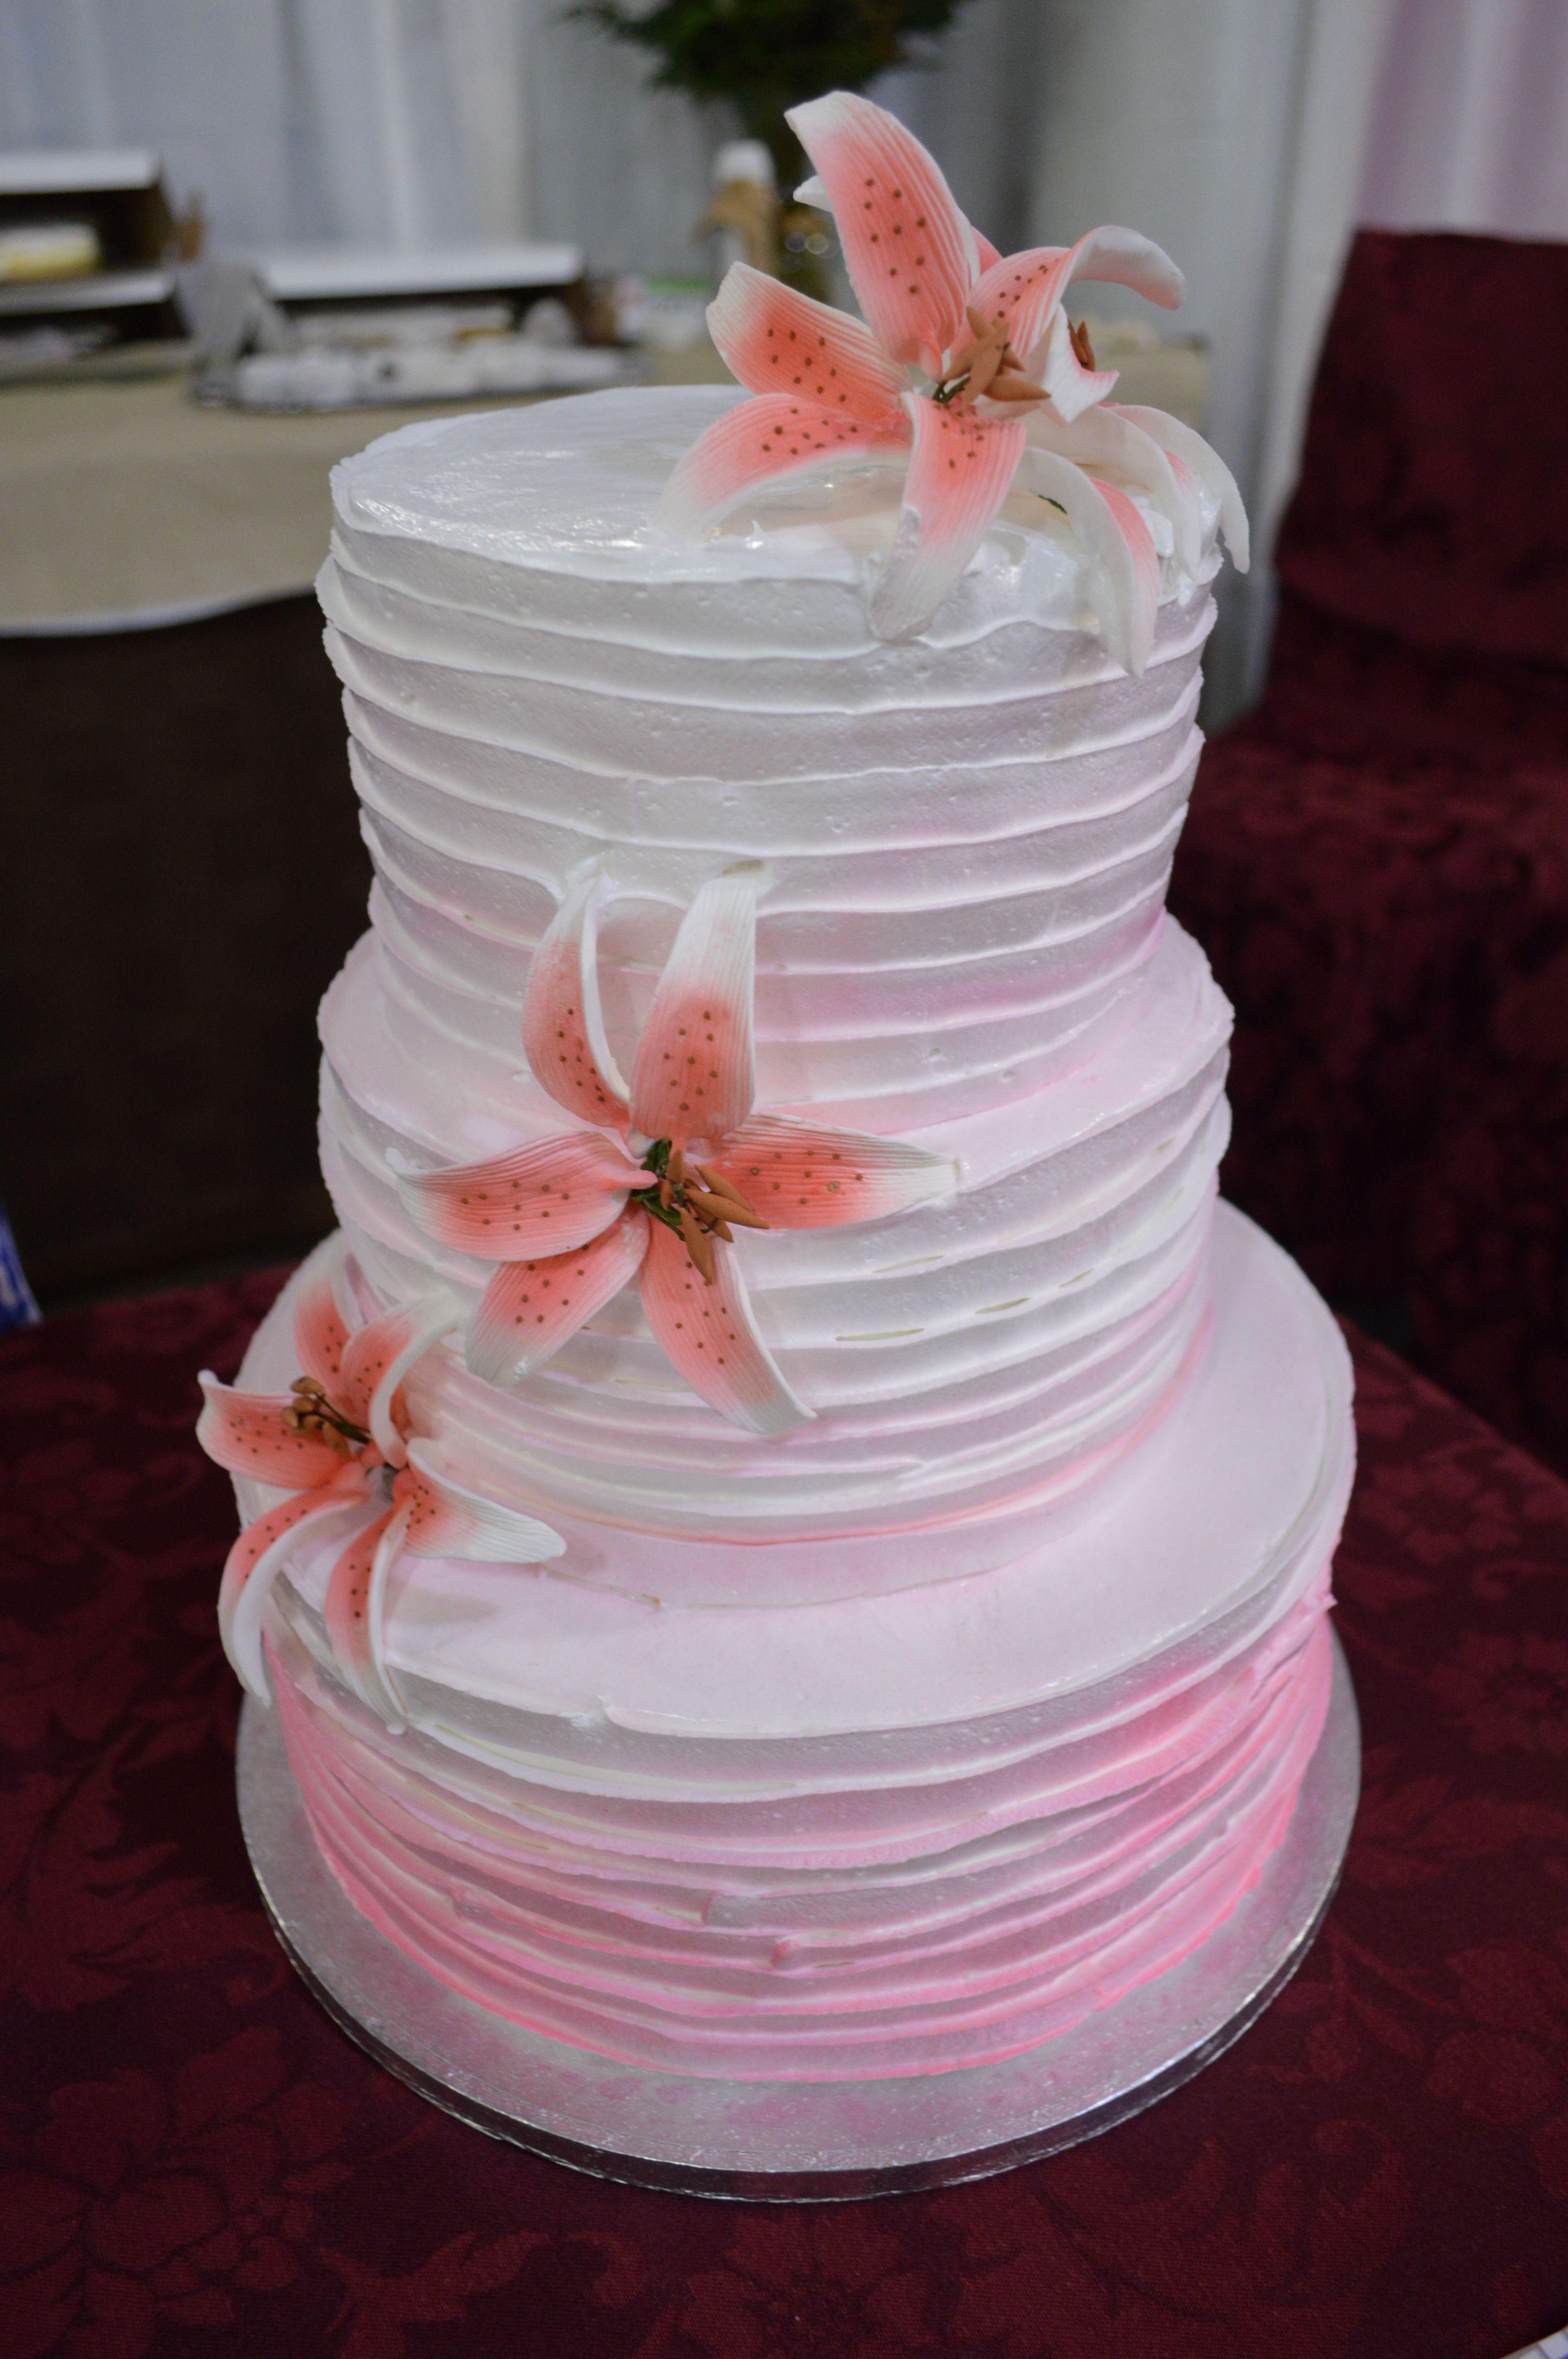 Wedding Cake Design Idea From The Patisserie Three Tier